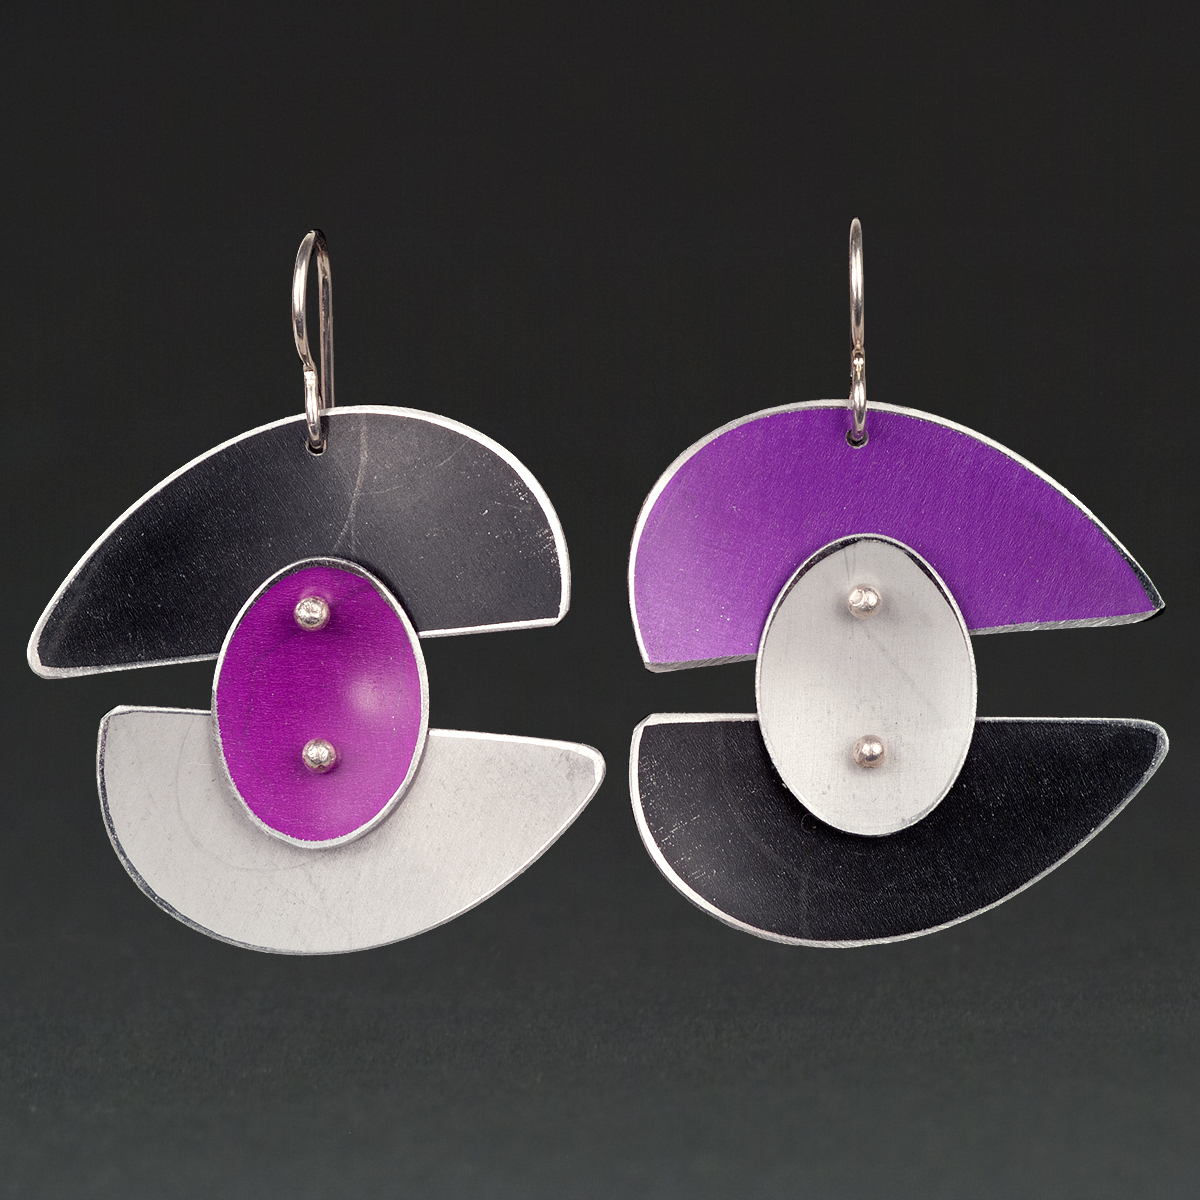 B - Black, Violet, Silver